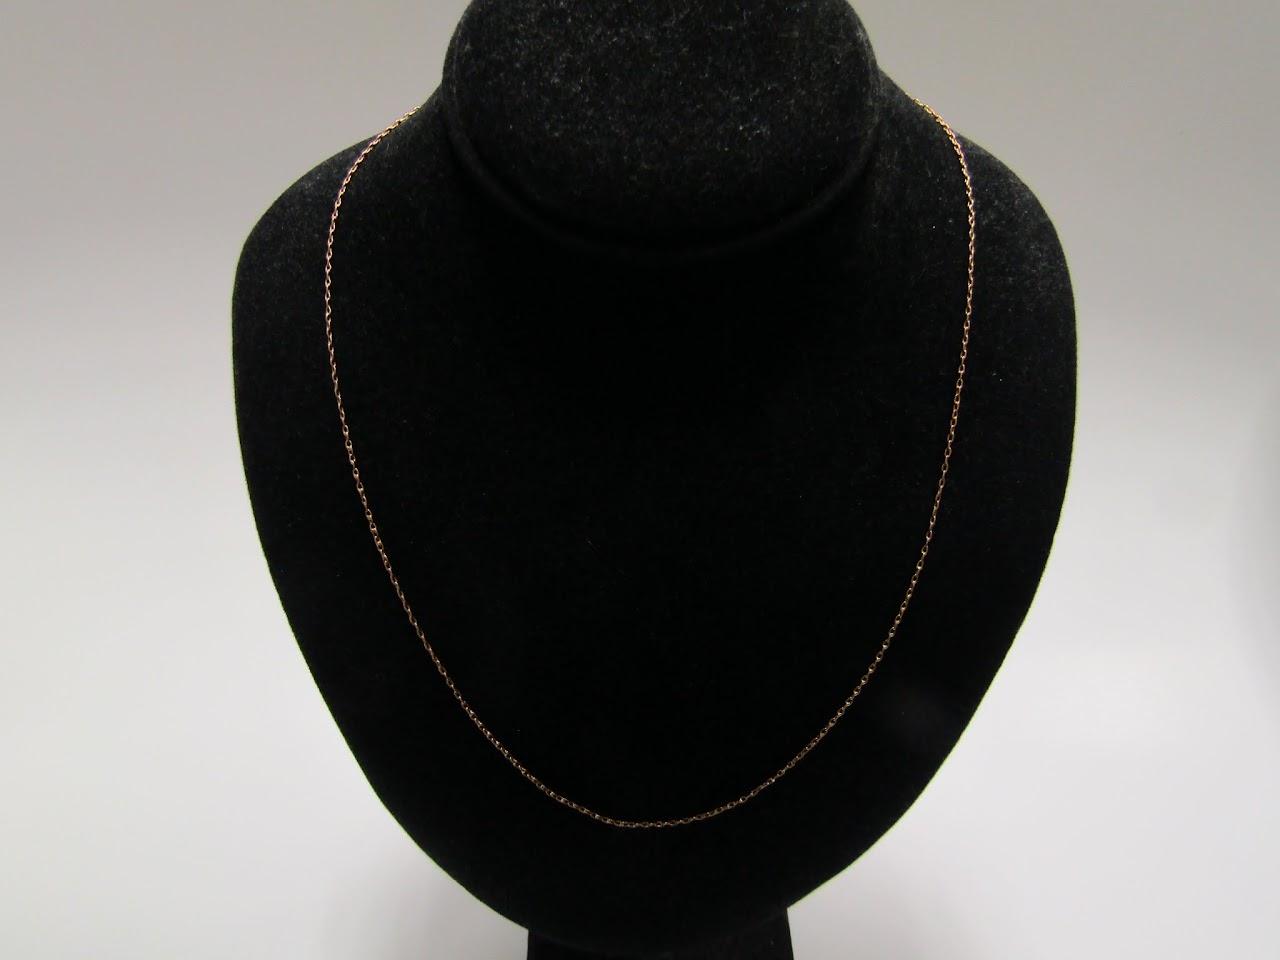 14 K Gold Thin Chain